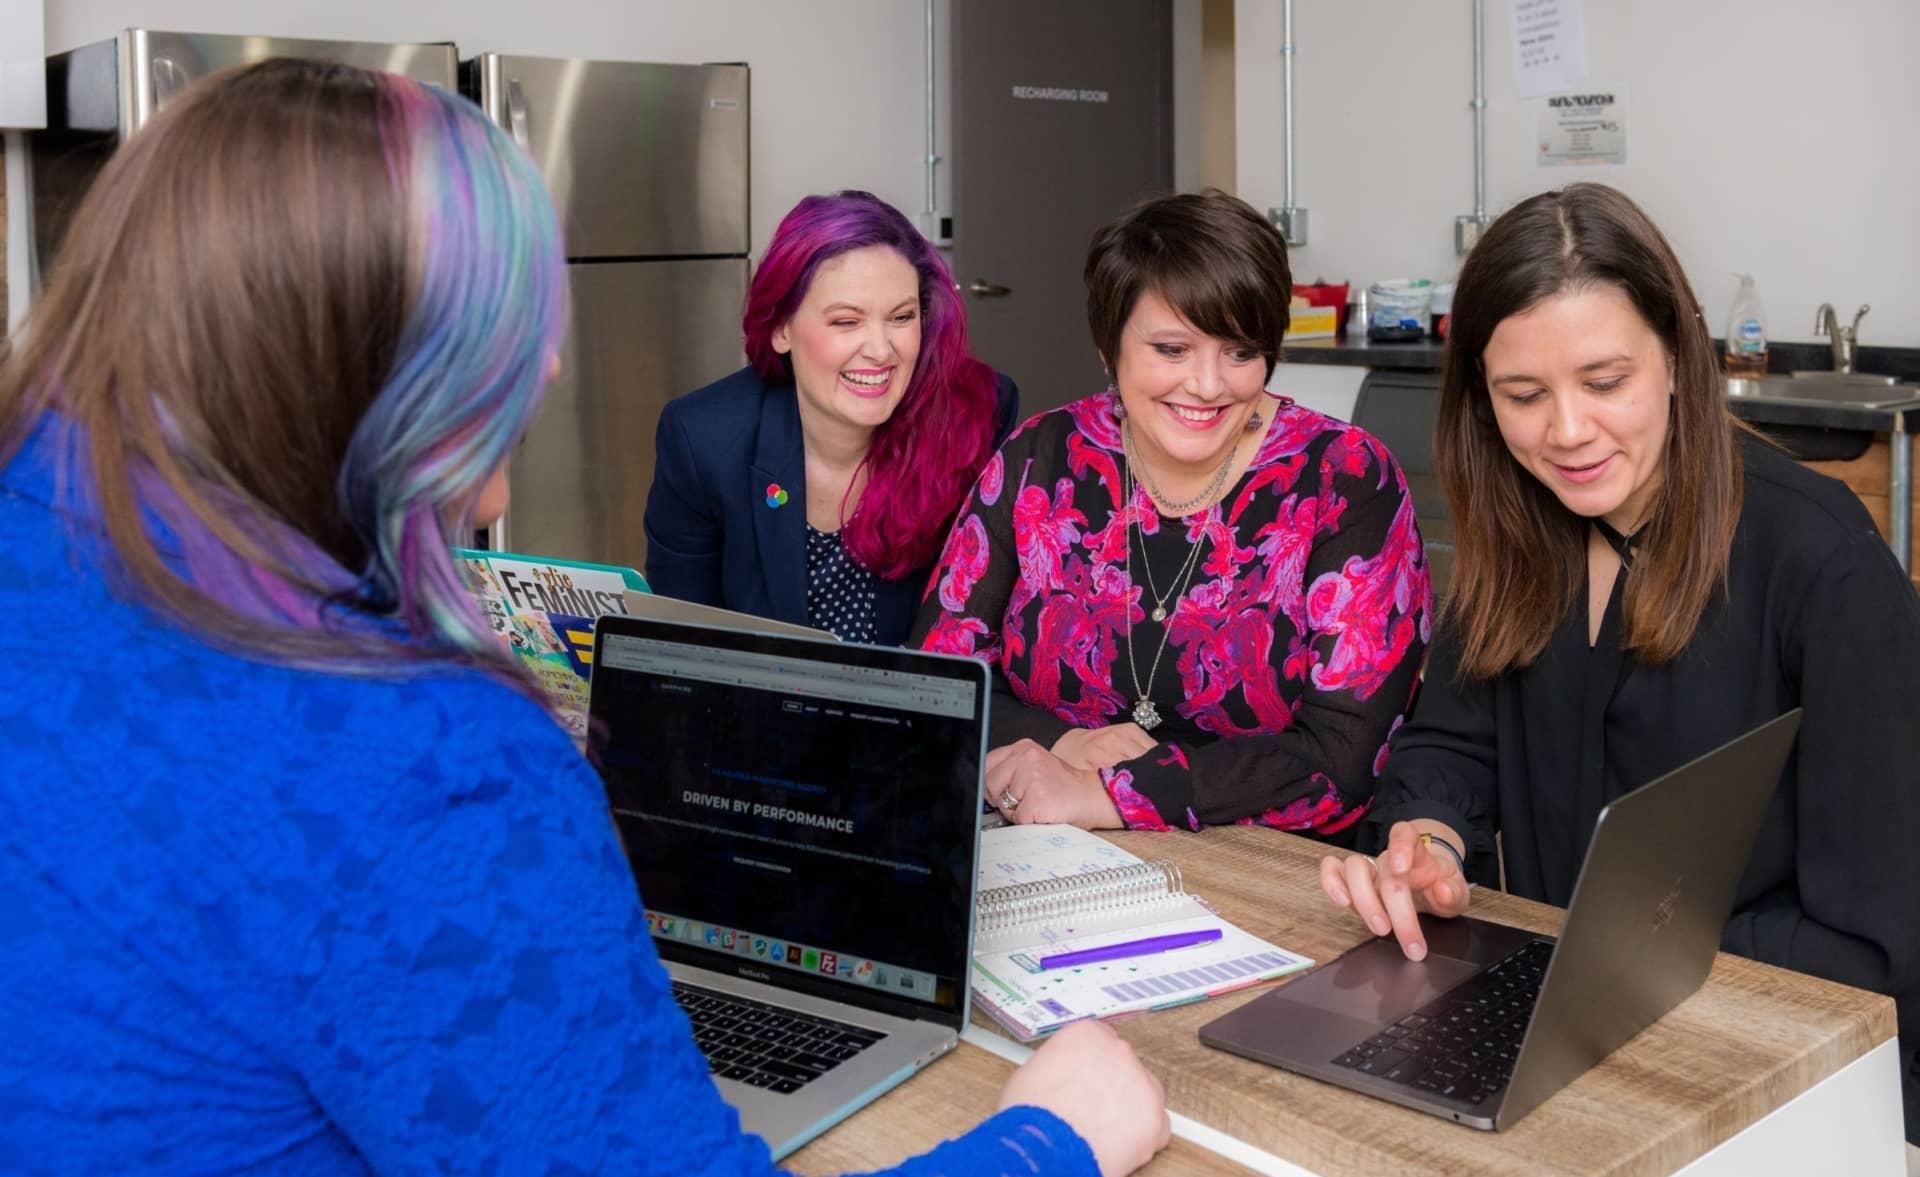 happy women in the workplace